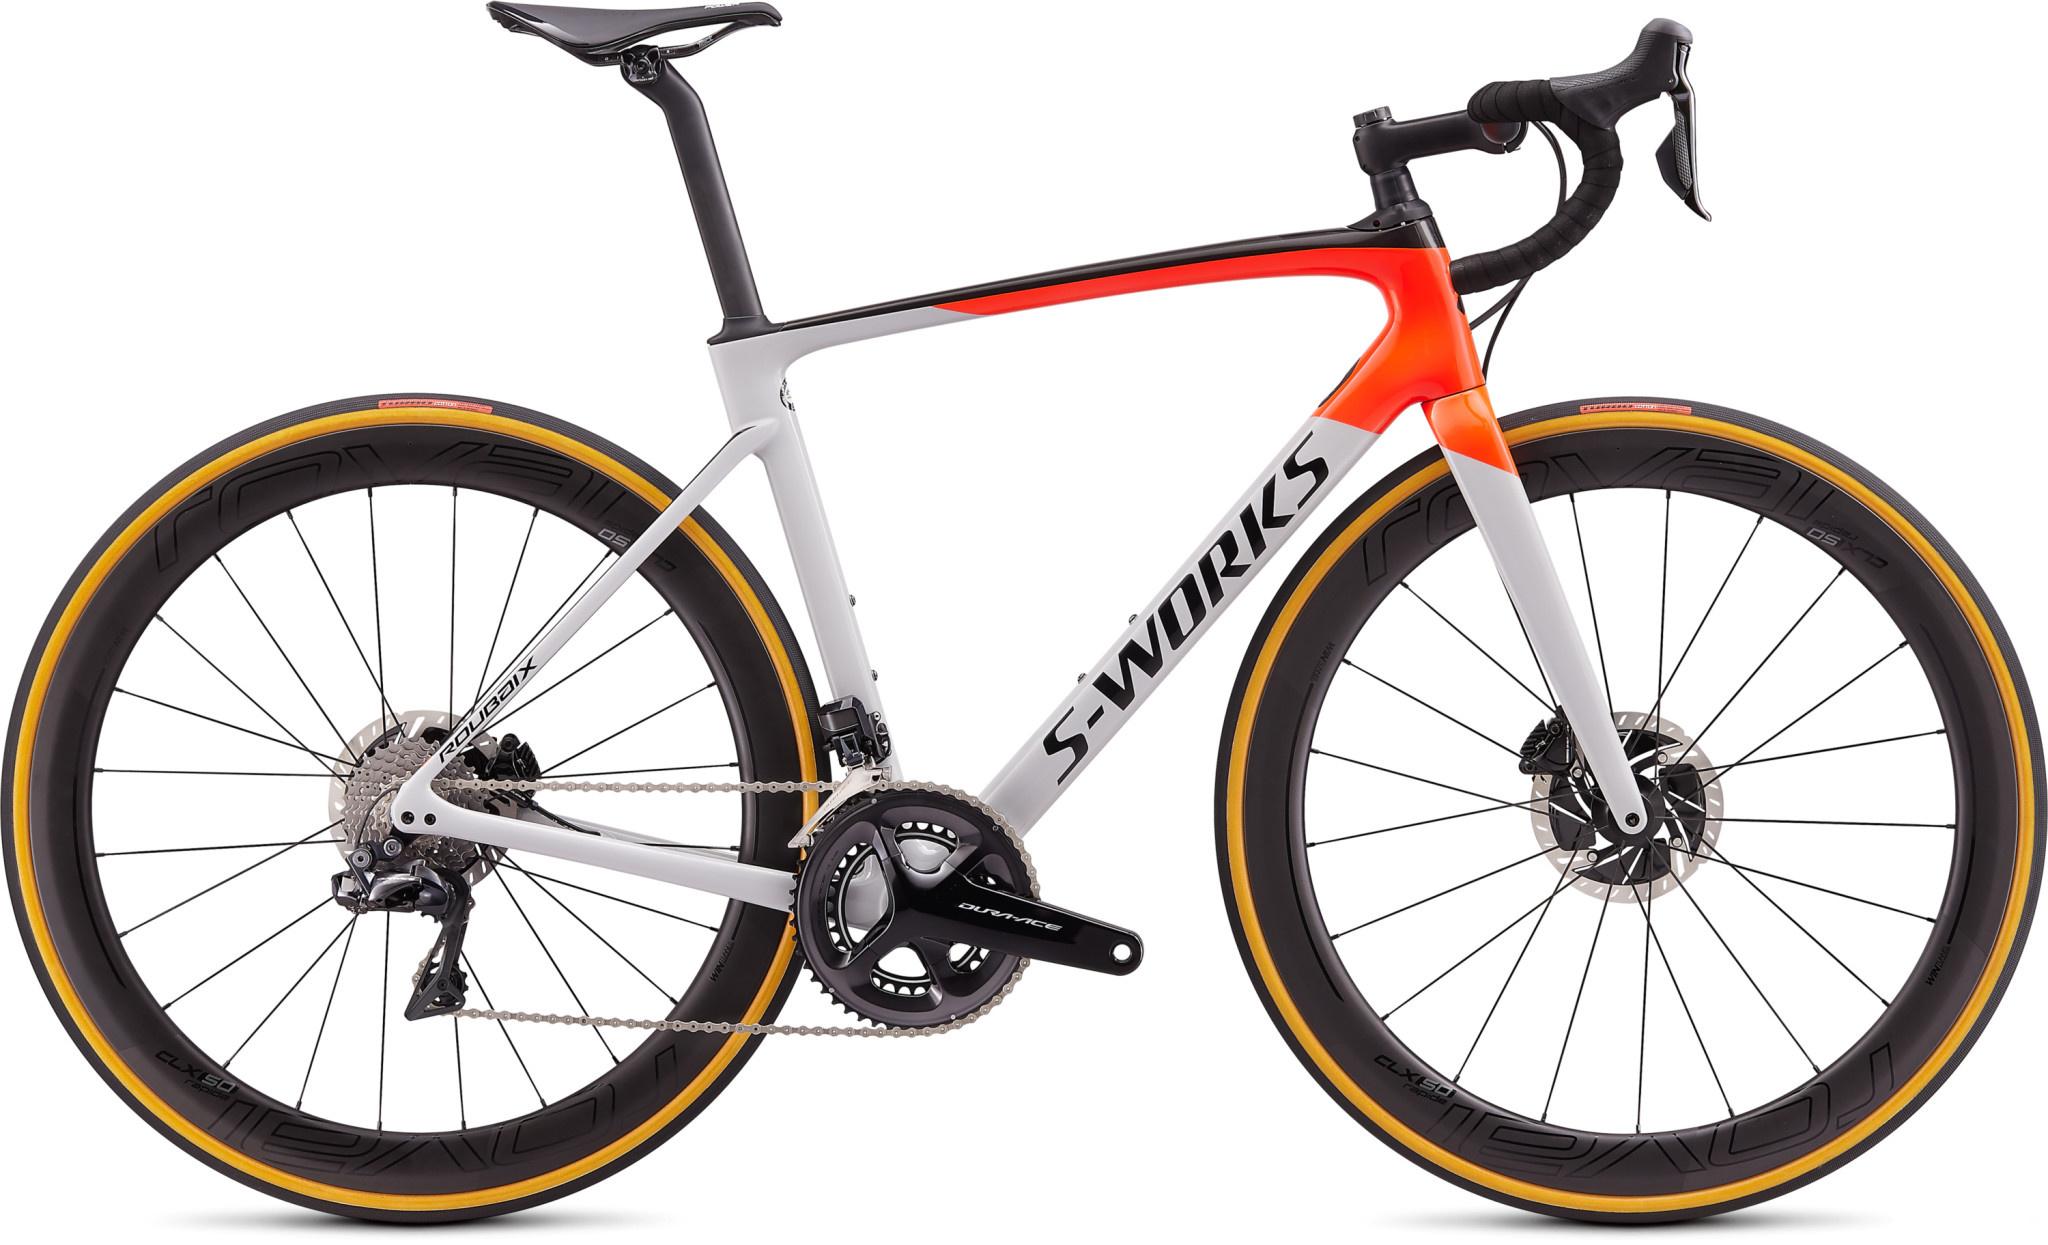 Specialized 2020 Roubaix S-Works Di2